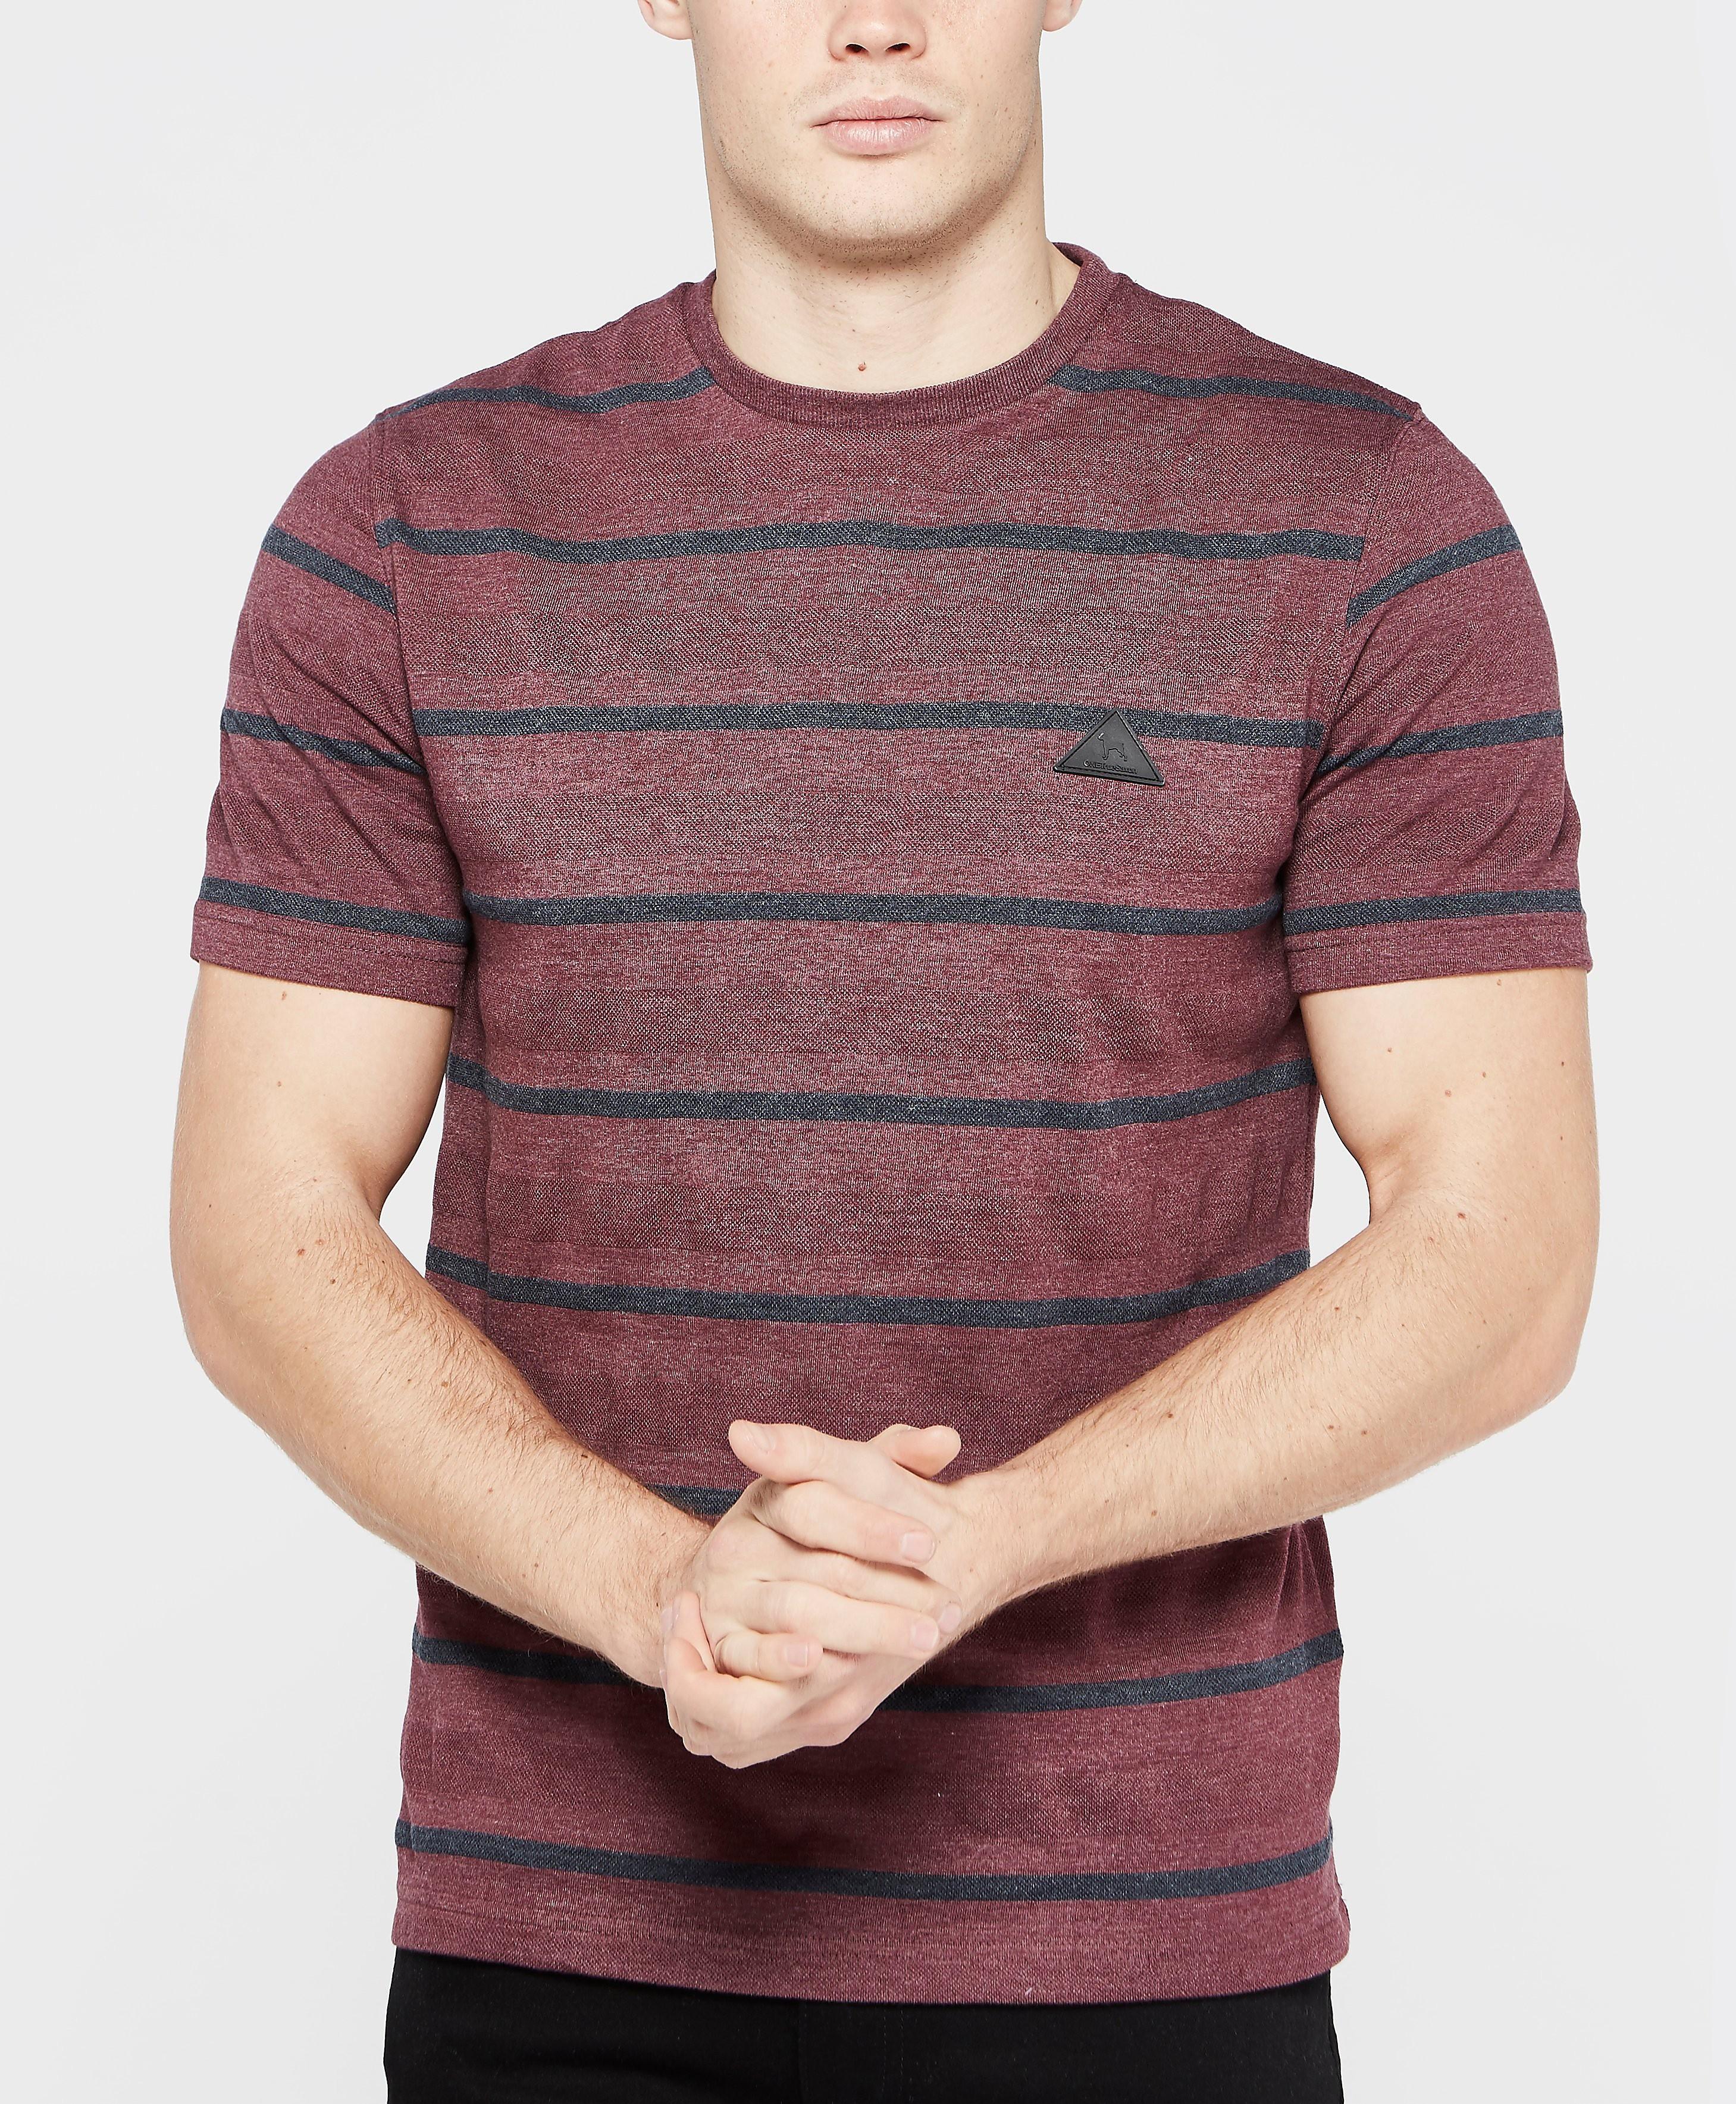 One True Saxon Tenue T-Shirt - Exclusive